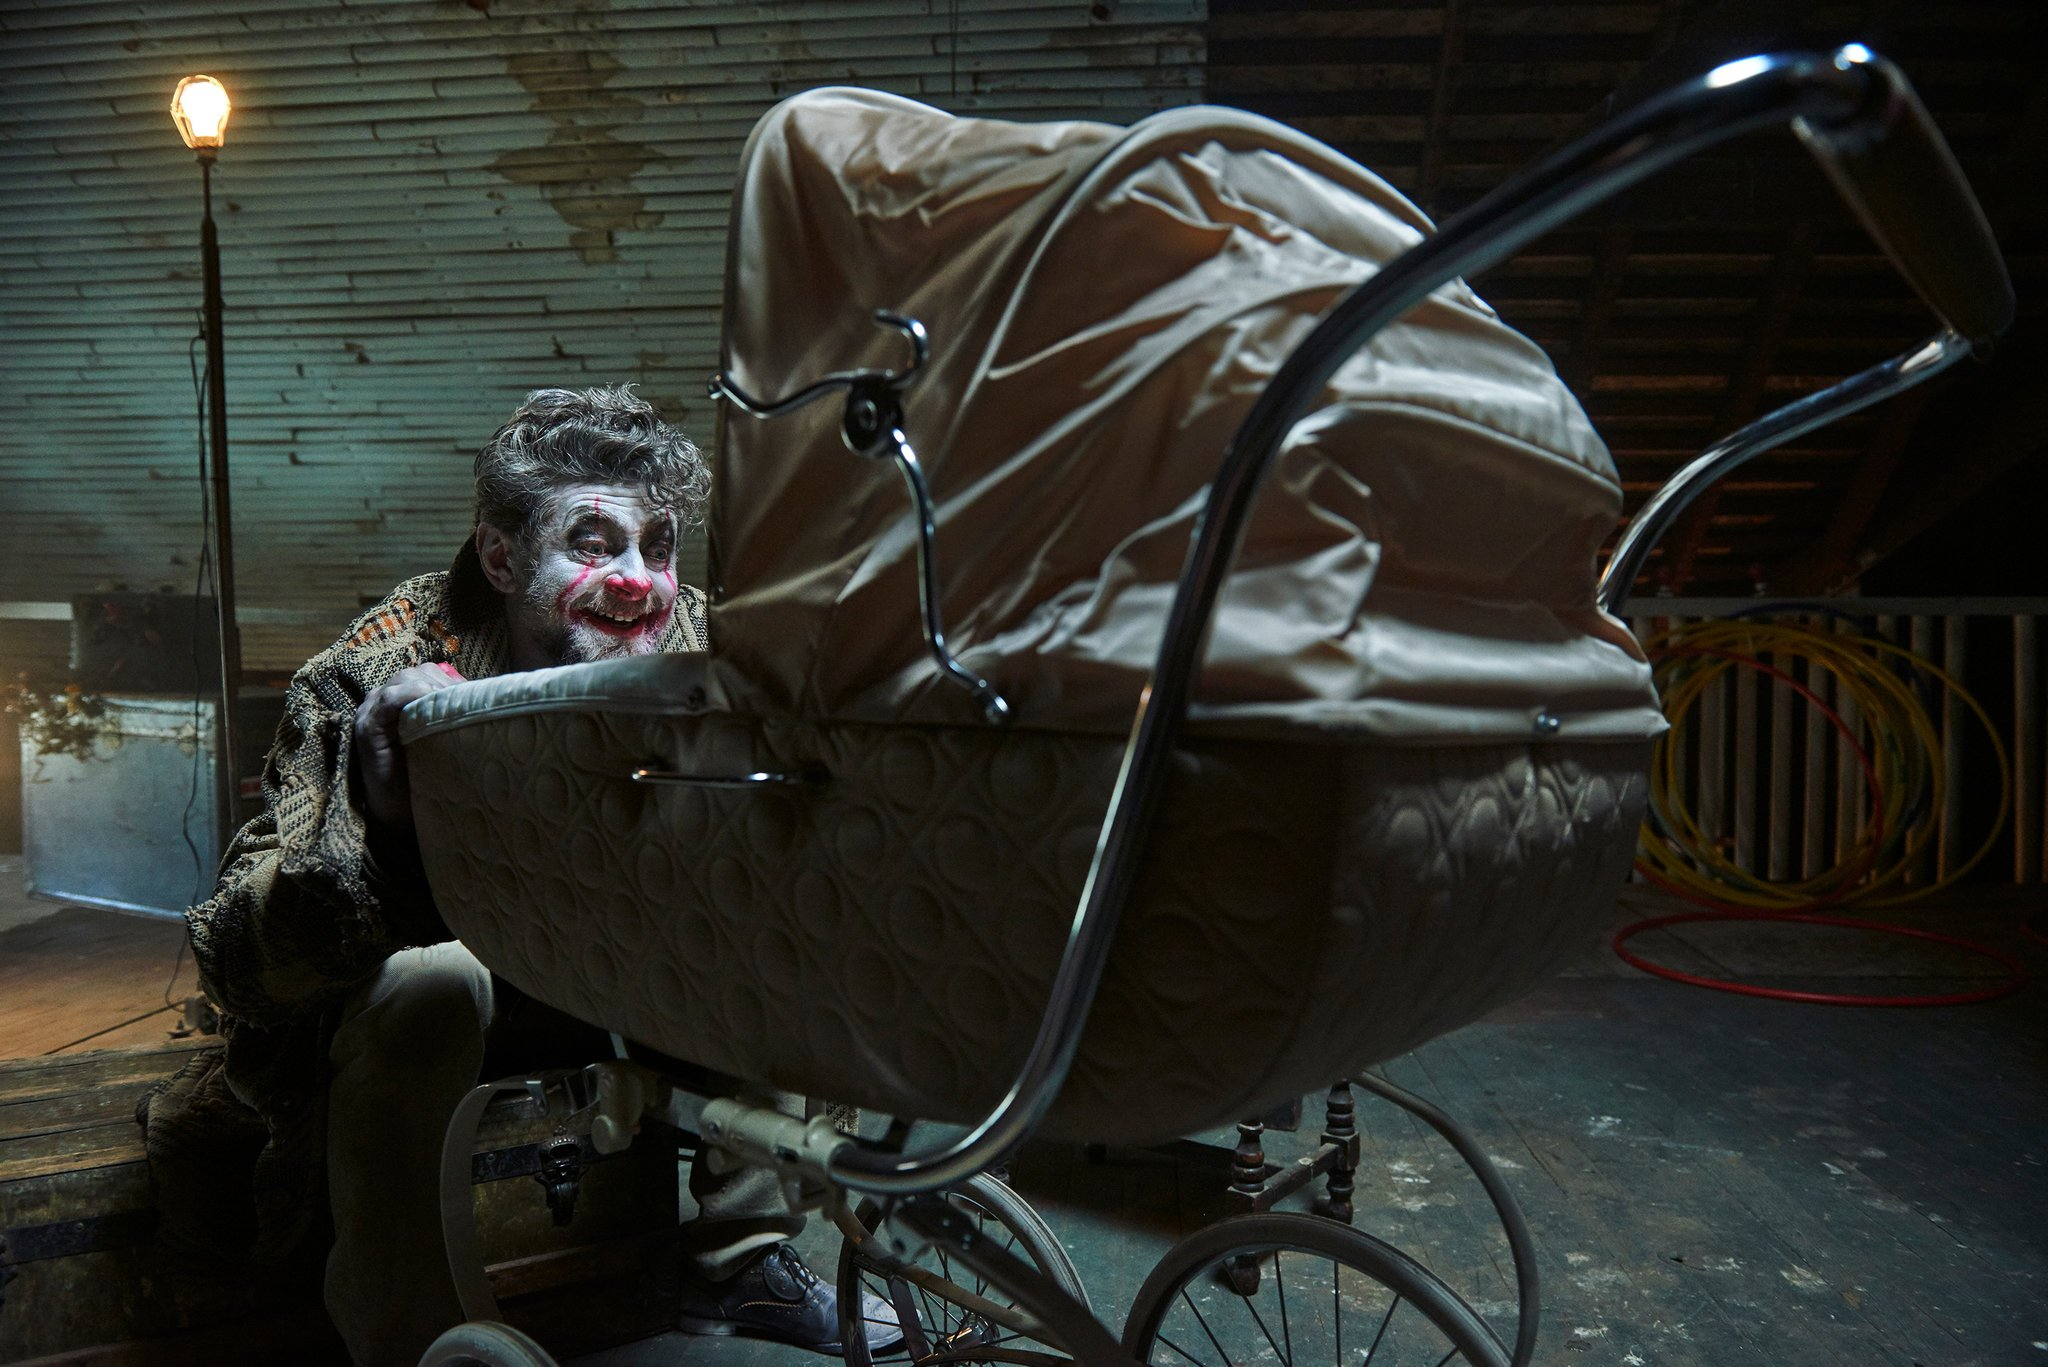 Голливудские звезды снялись в хоррор-проекте The New York Times-Фото 5